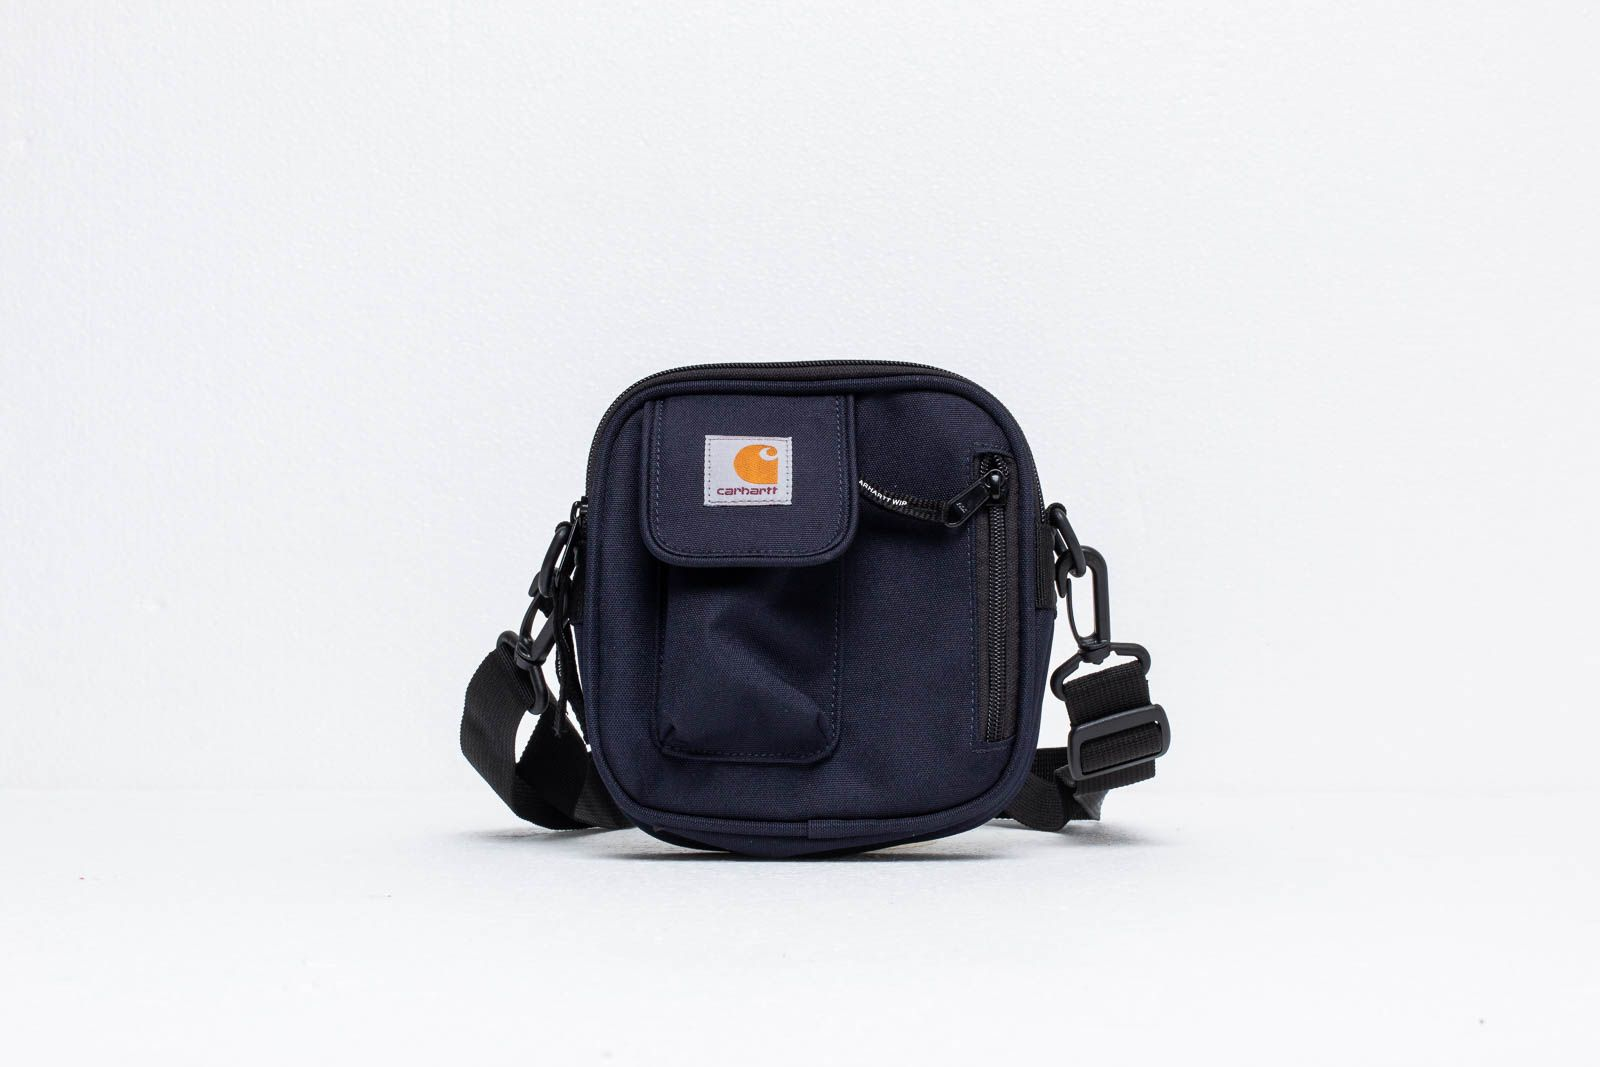 Carhartt WIP Essentials Small Bag